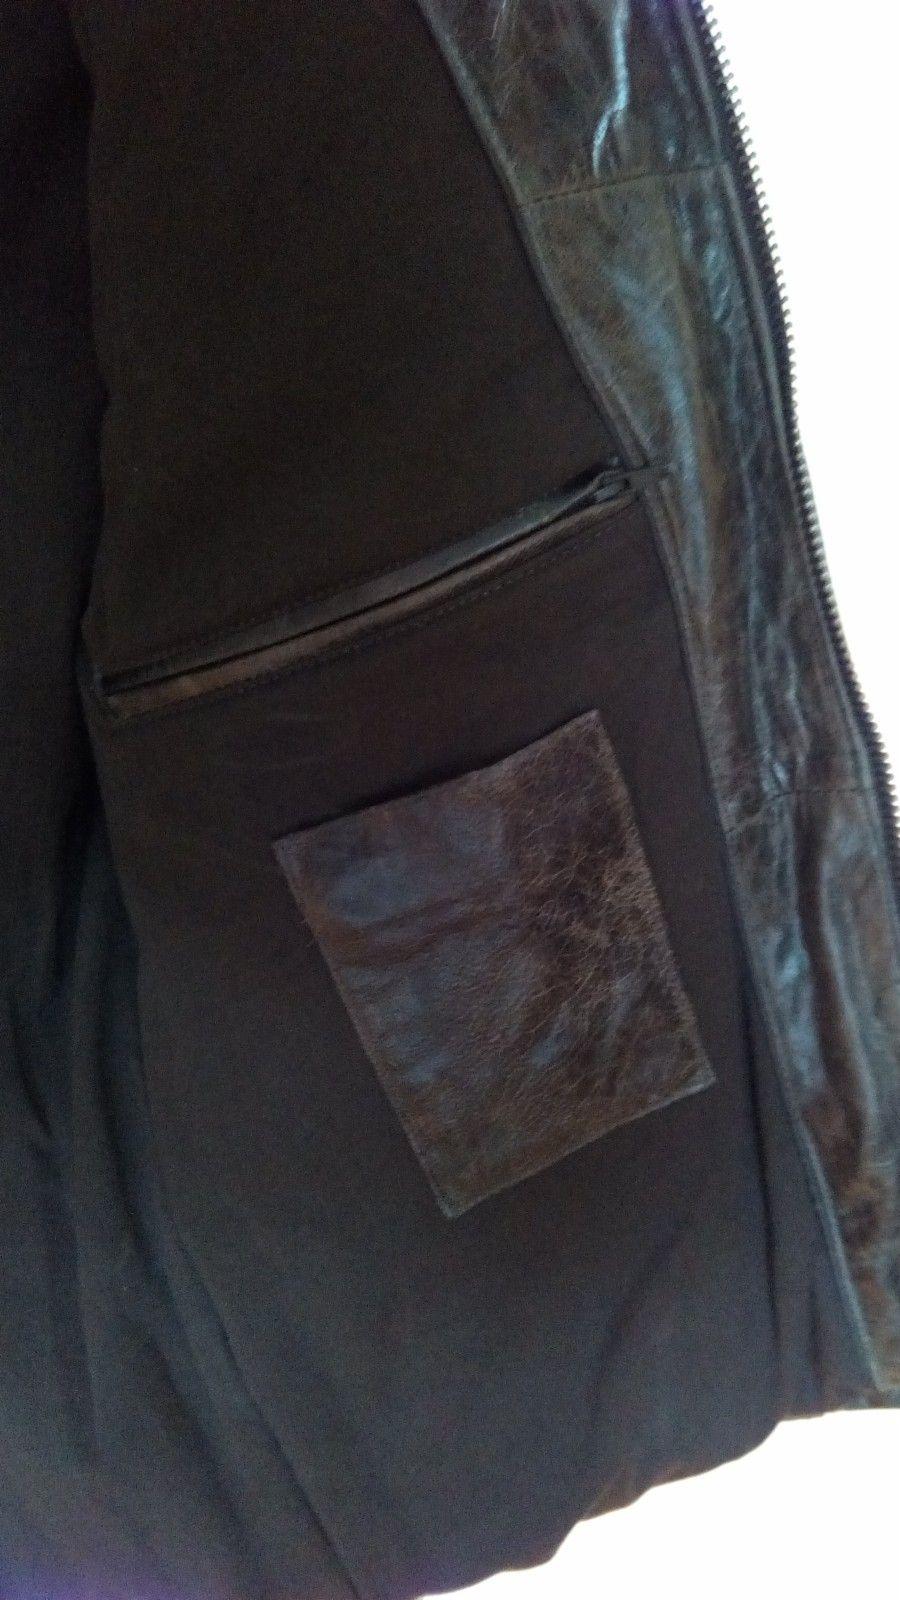 NY Leatherman Solid Skinnjakke Mørke Brun Gi BUD! | FINN.no